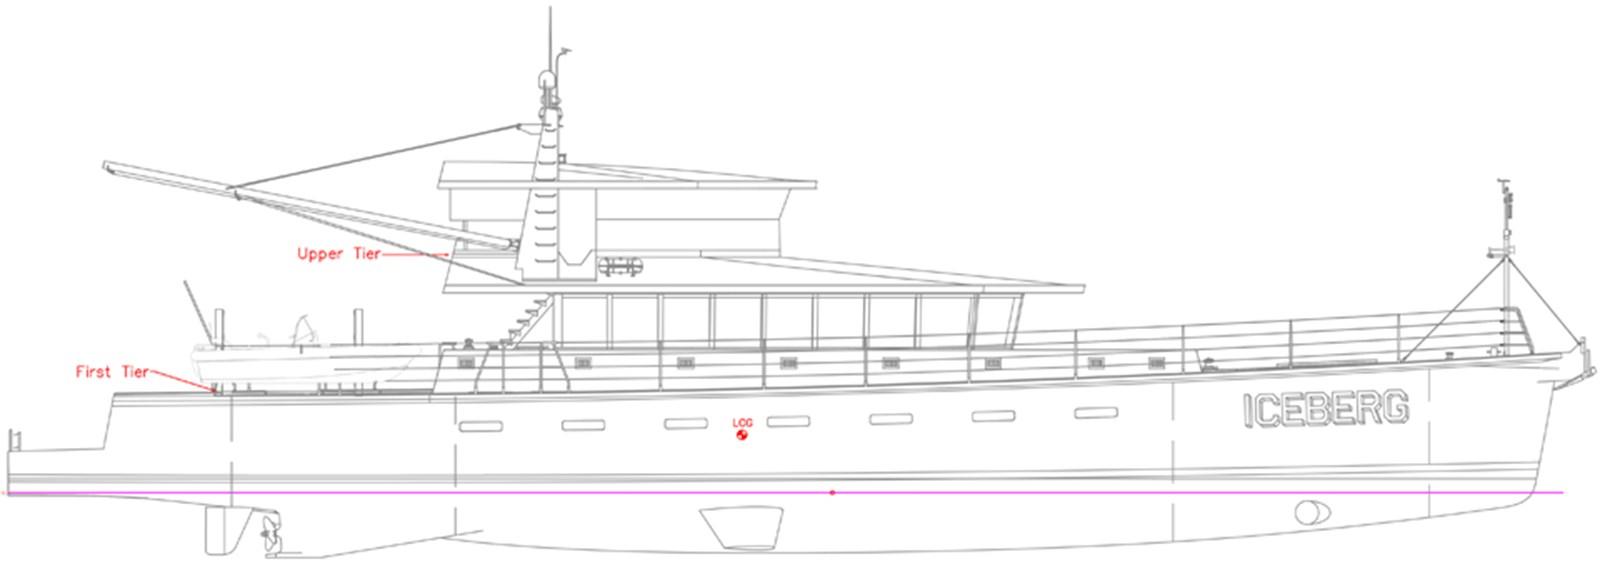 fpb-97-layout-4 2014 CIRCA MARINE FPB 97 Motor Yacht 2788456